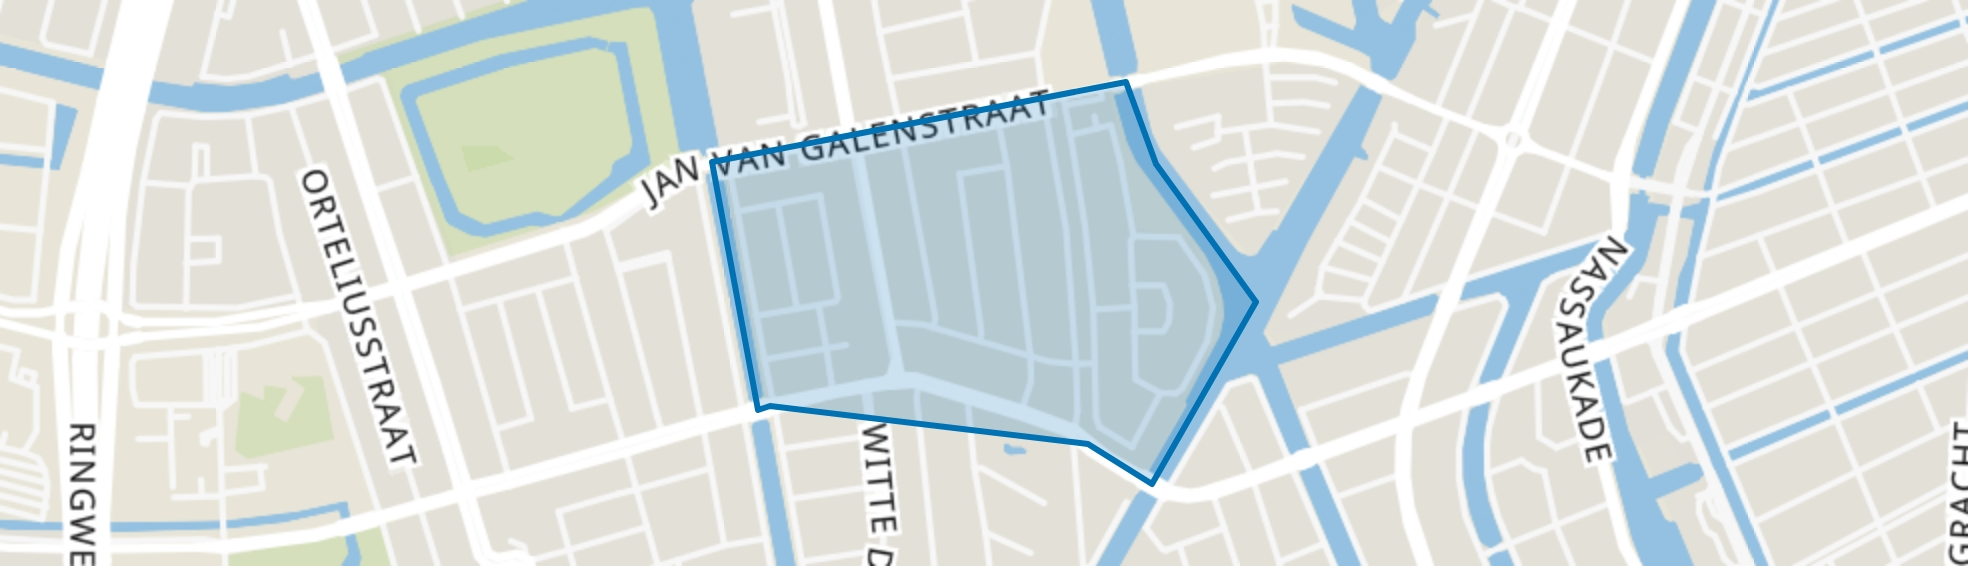 Geuzenbuurt, Amsterdam map